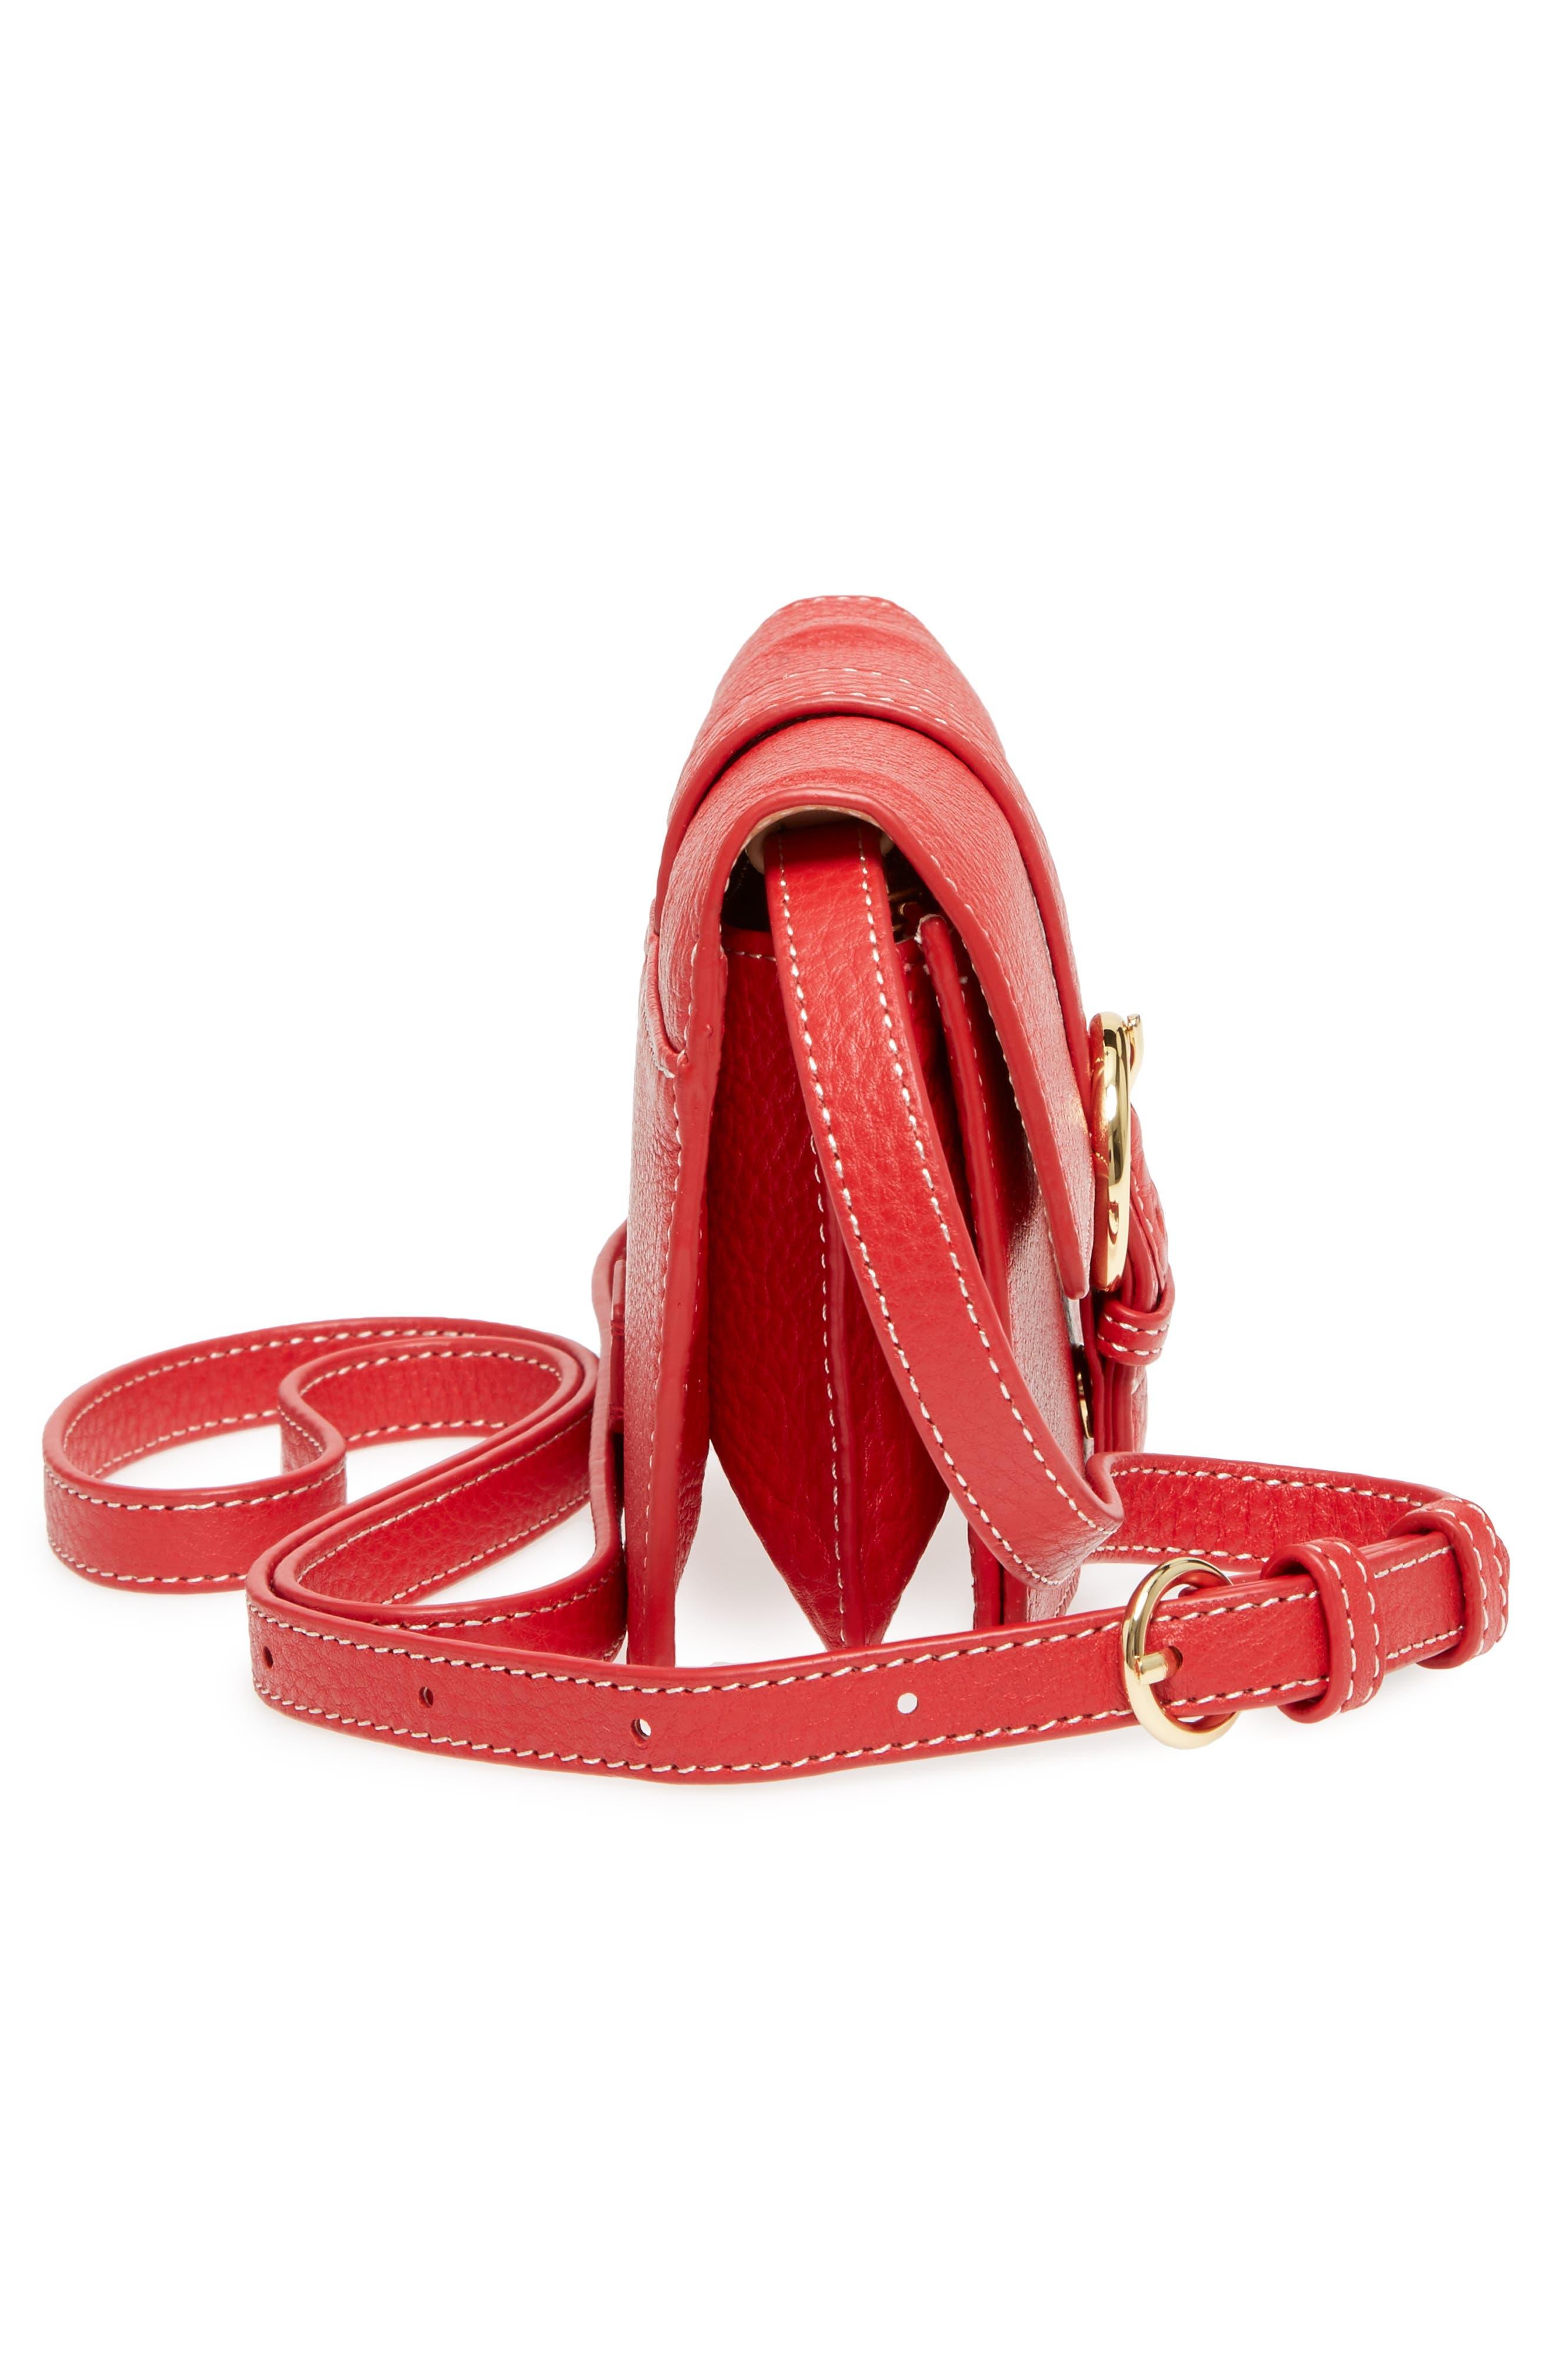 Calfskin Leather Crossbody Wallet,                             Alternate thumbnail 20, color,